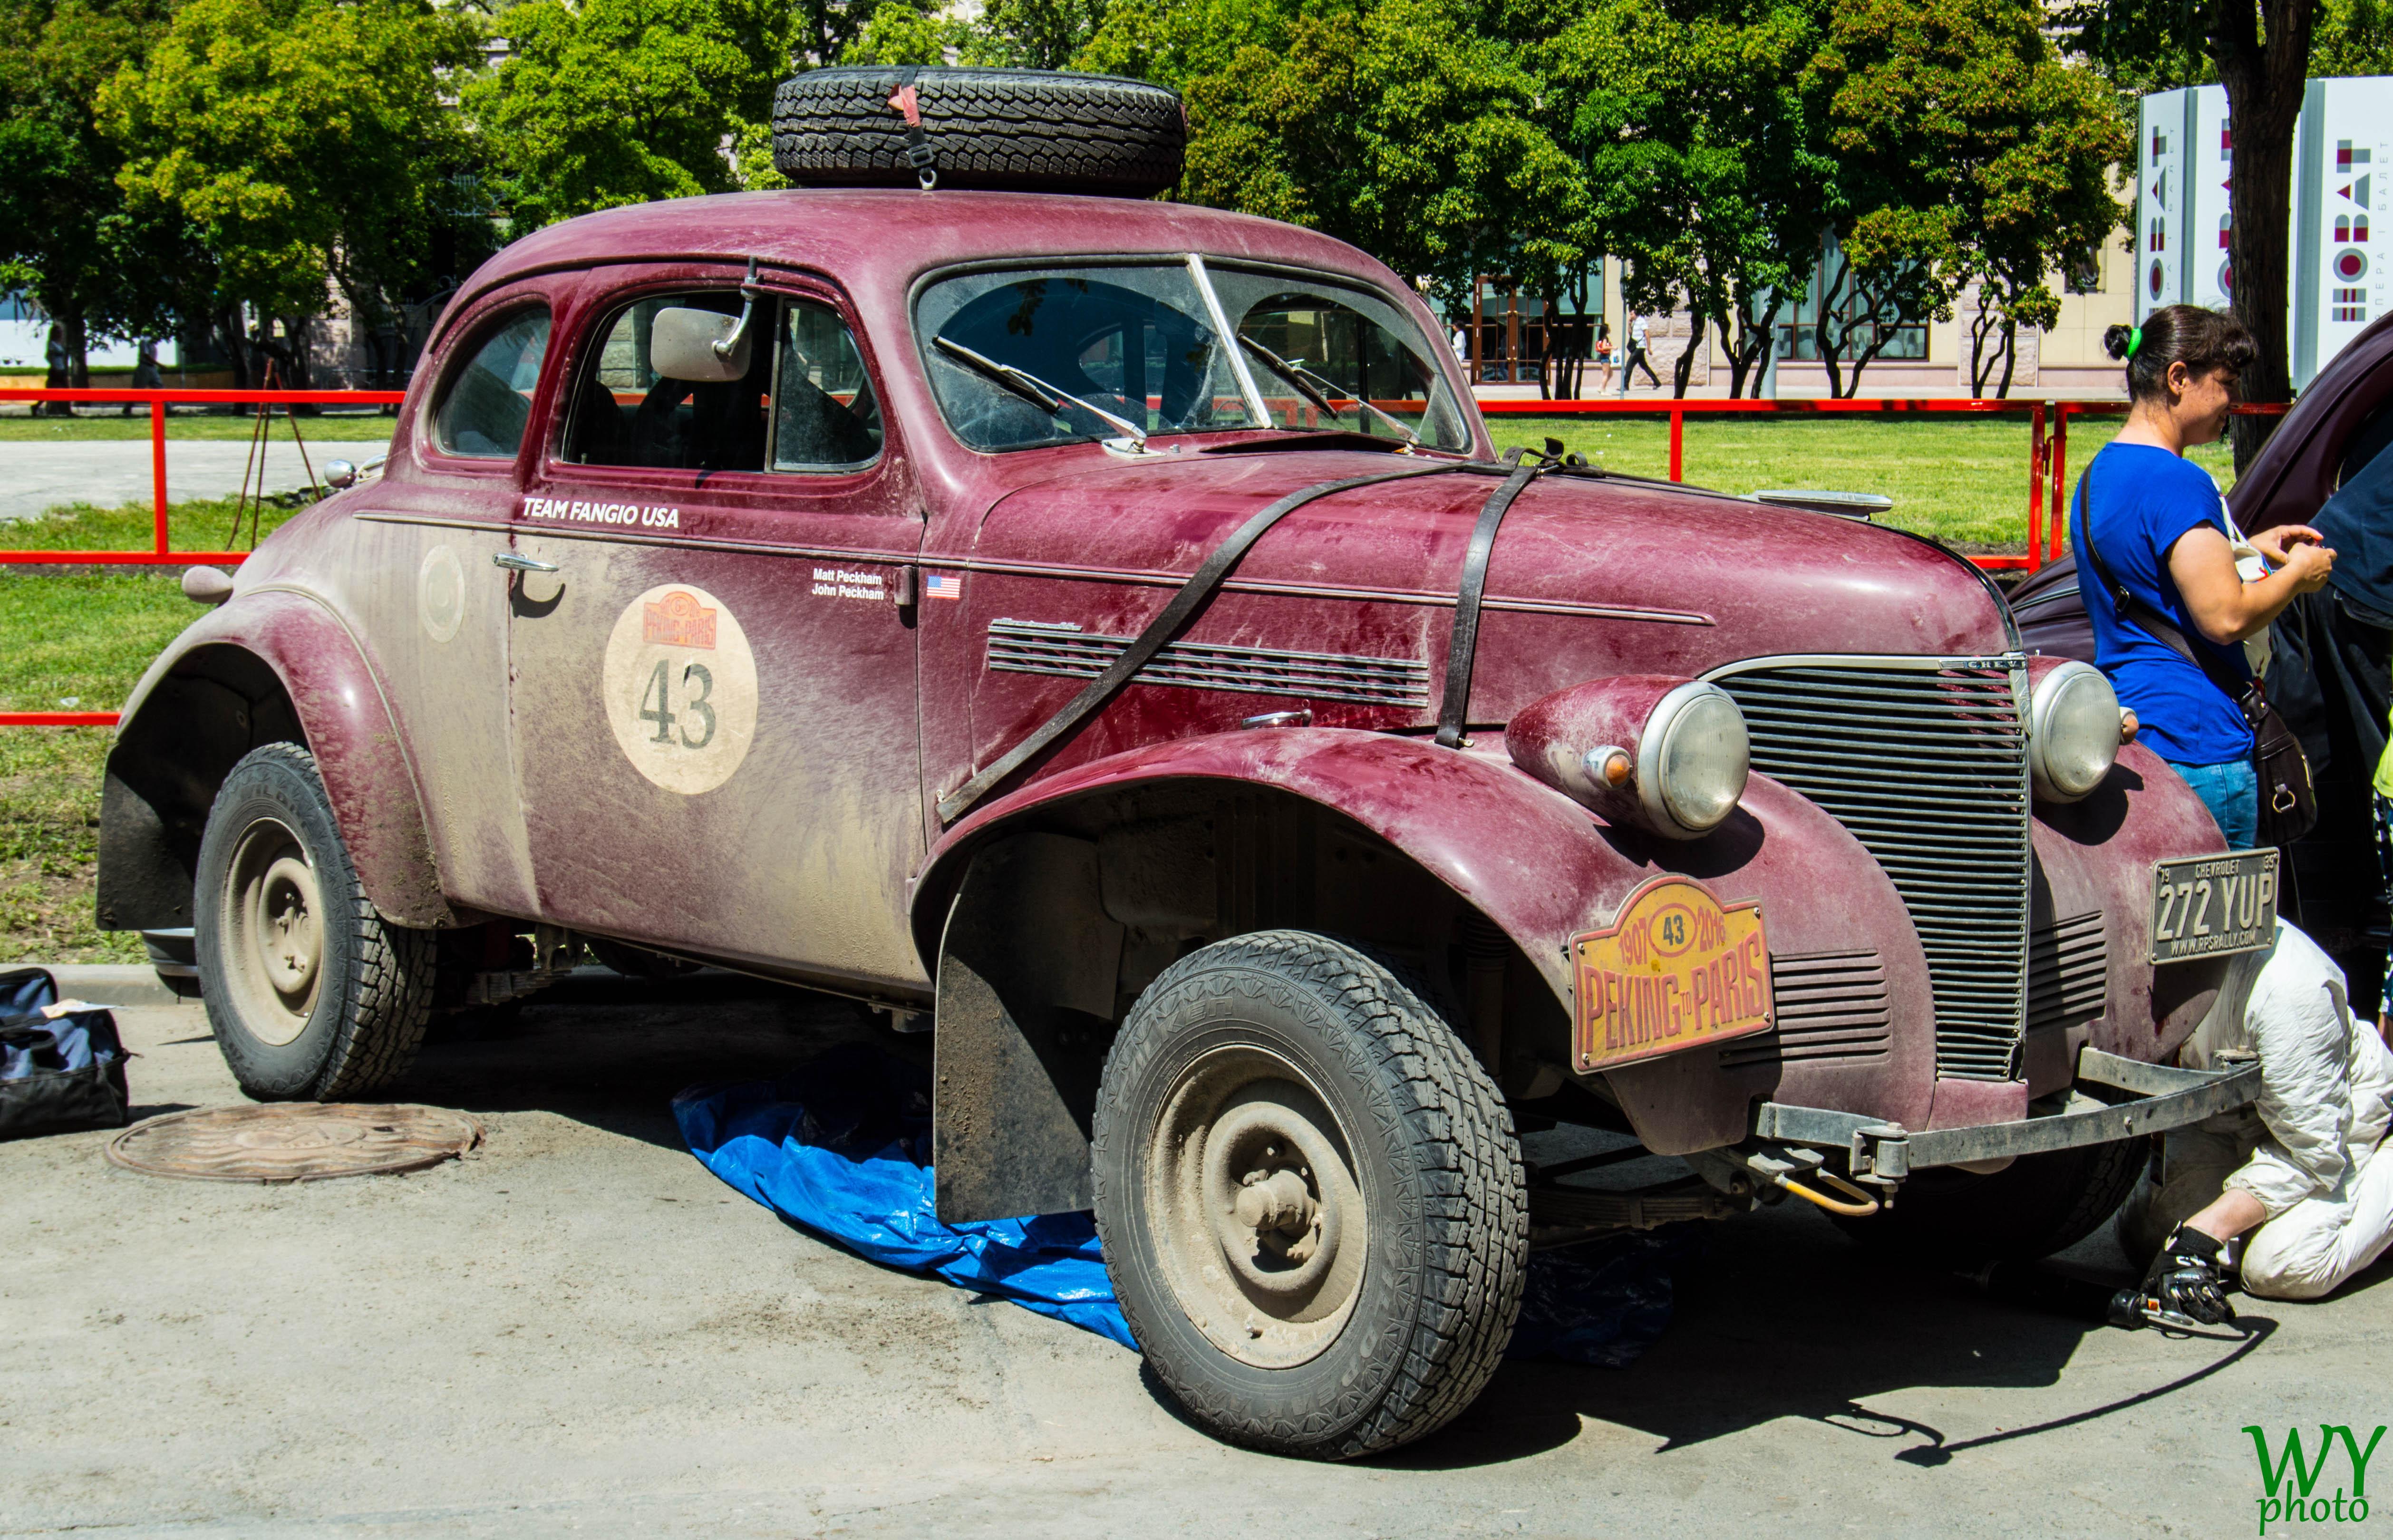 Team fangio 1939 chevrolet coupe photo